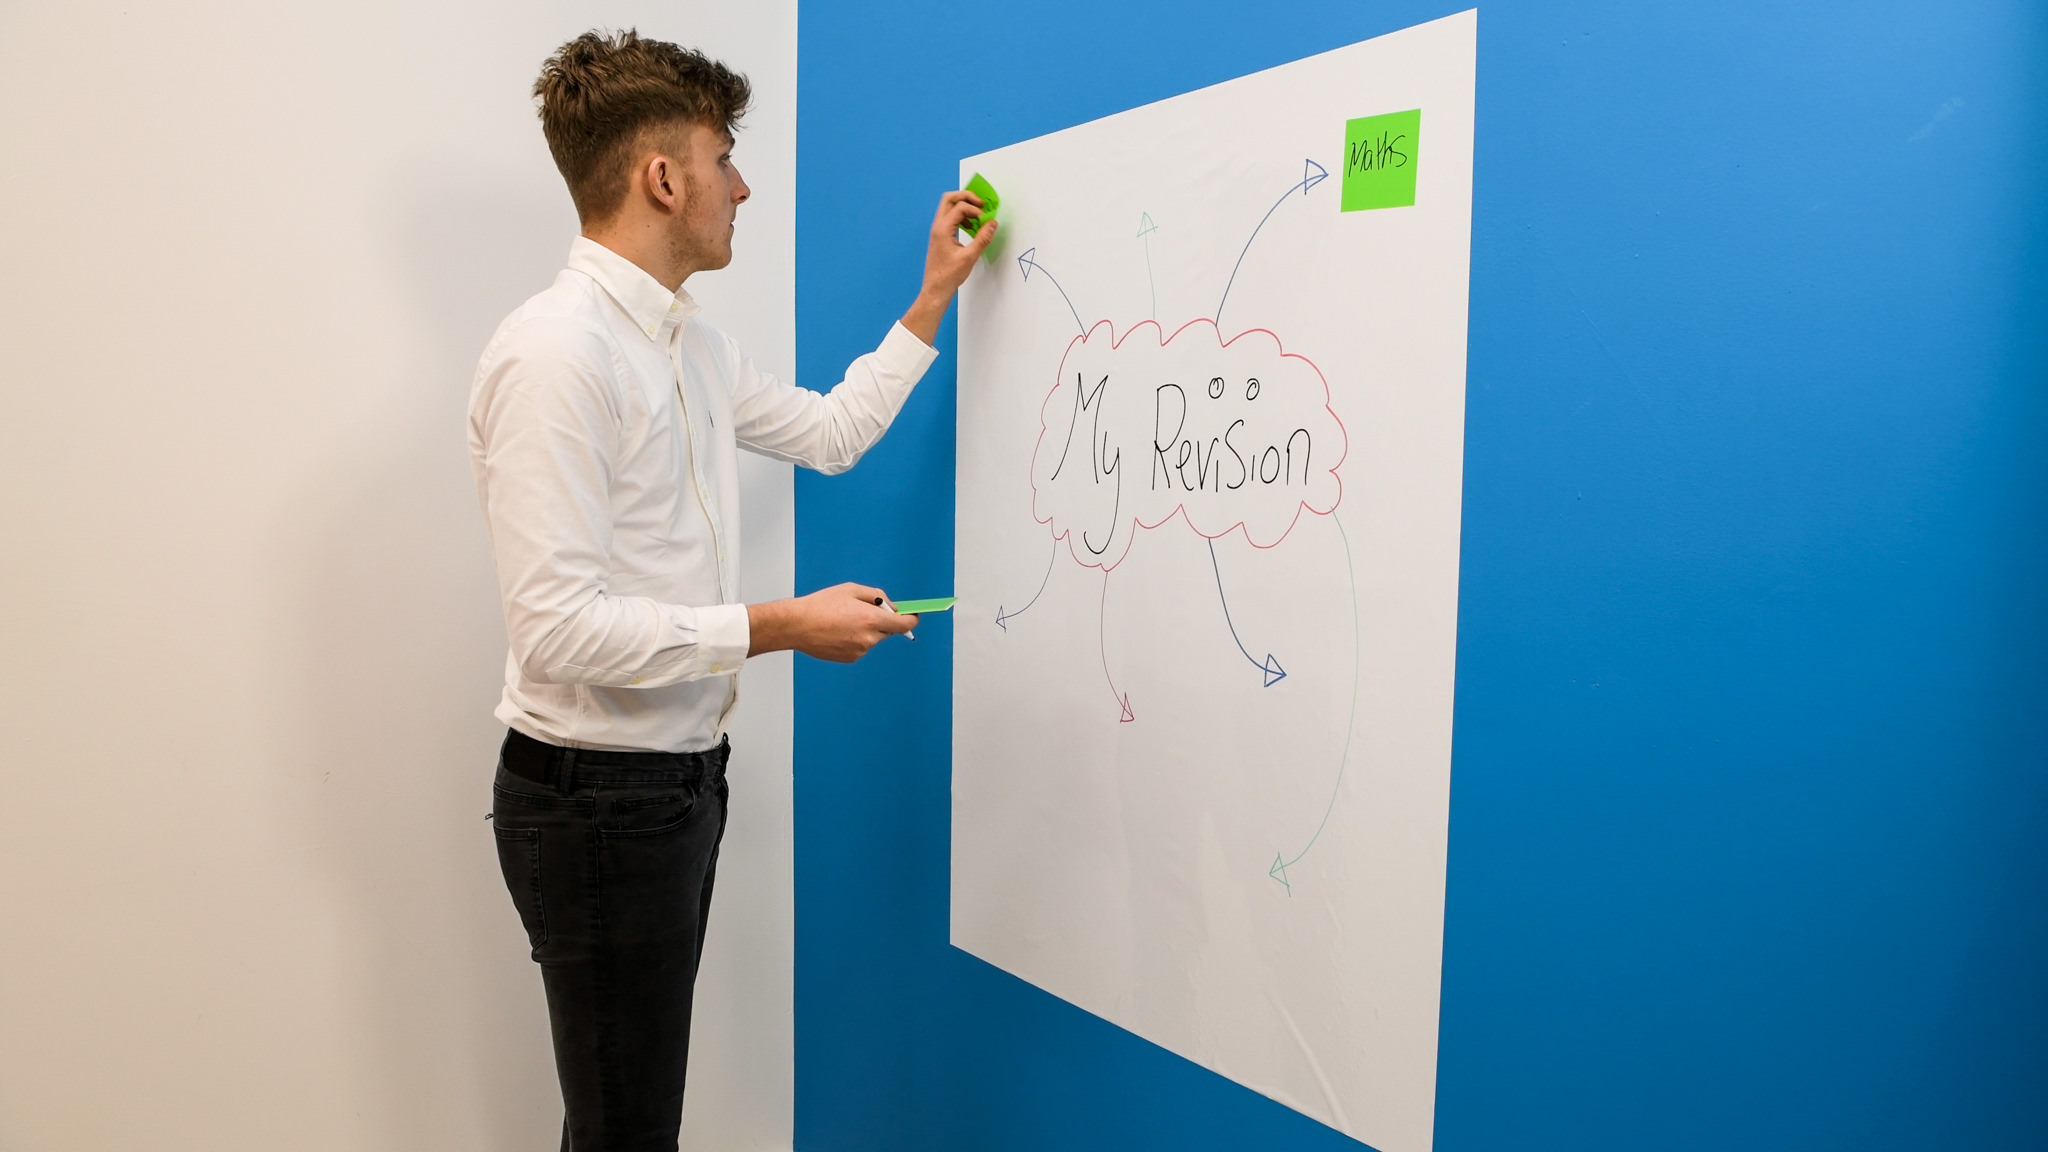 A0 Magic Whiteboard - large whiteboard and whiteboard walls